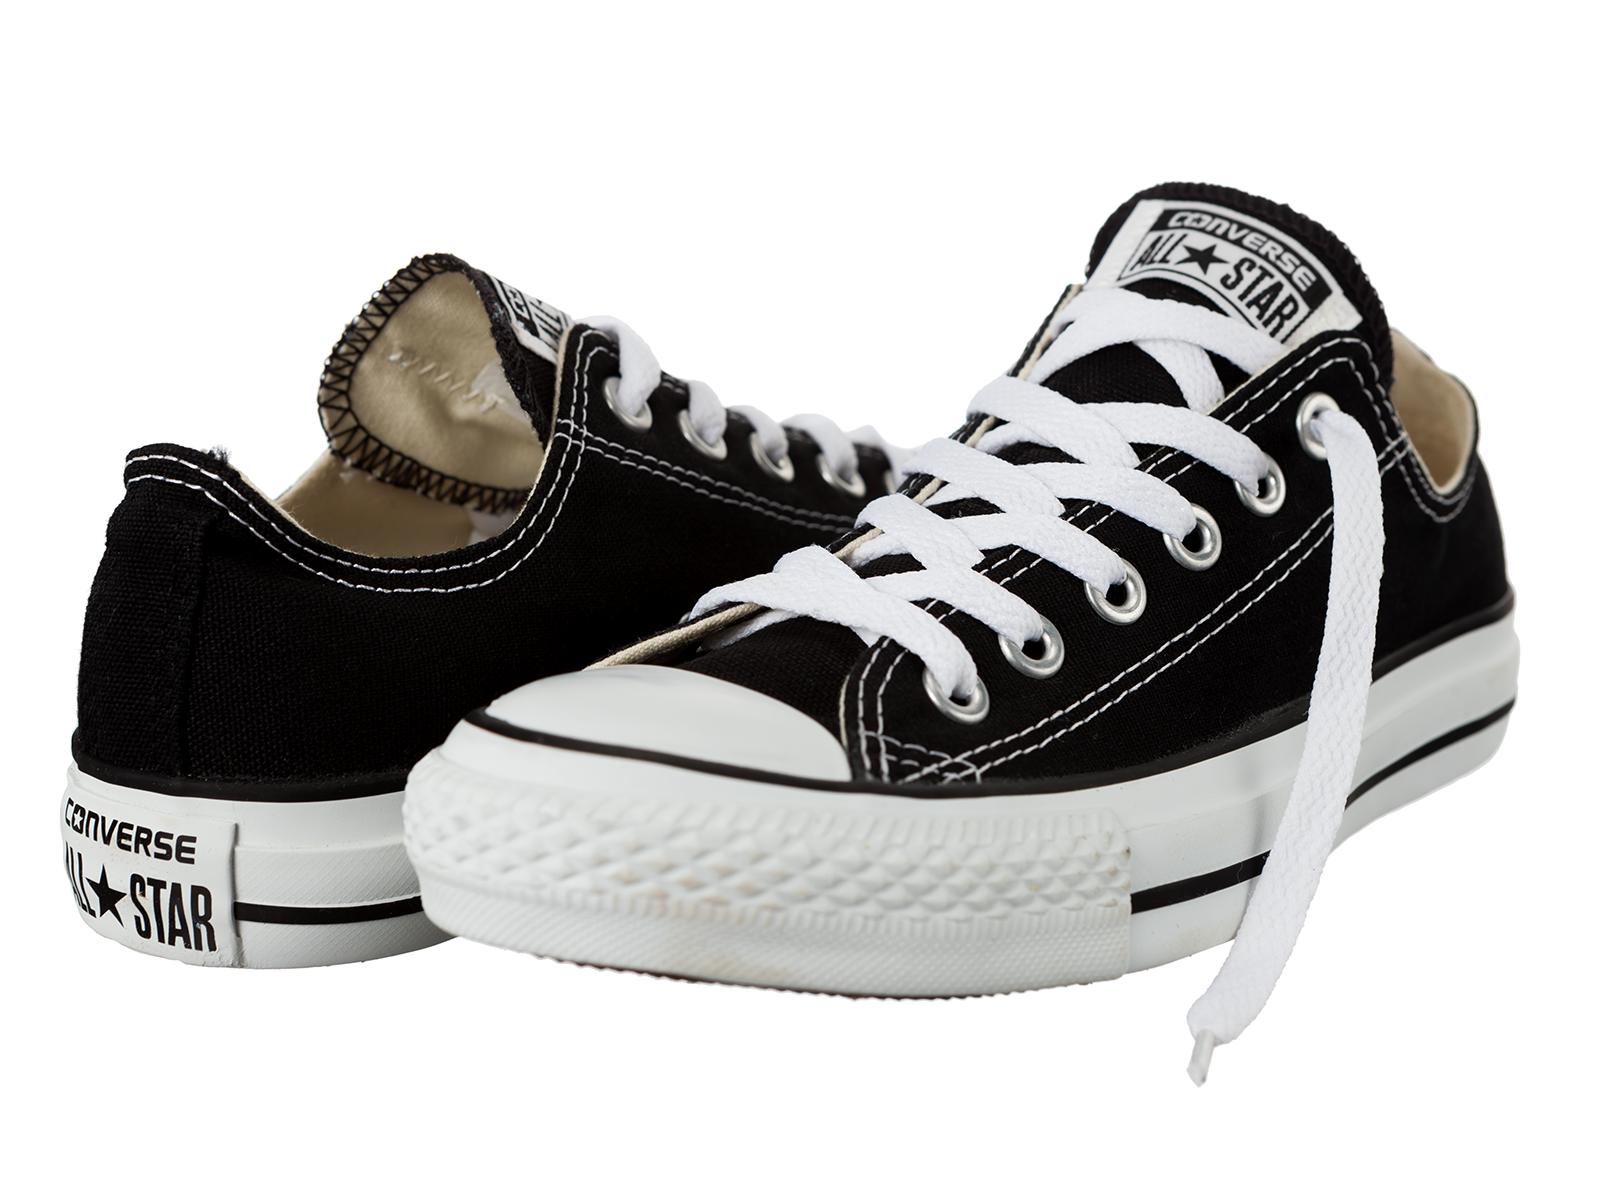 converse chucks all star black m9166 35 53 schwarz alle. Black Bedroom Furniture Sets. Home Design Ideas